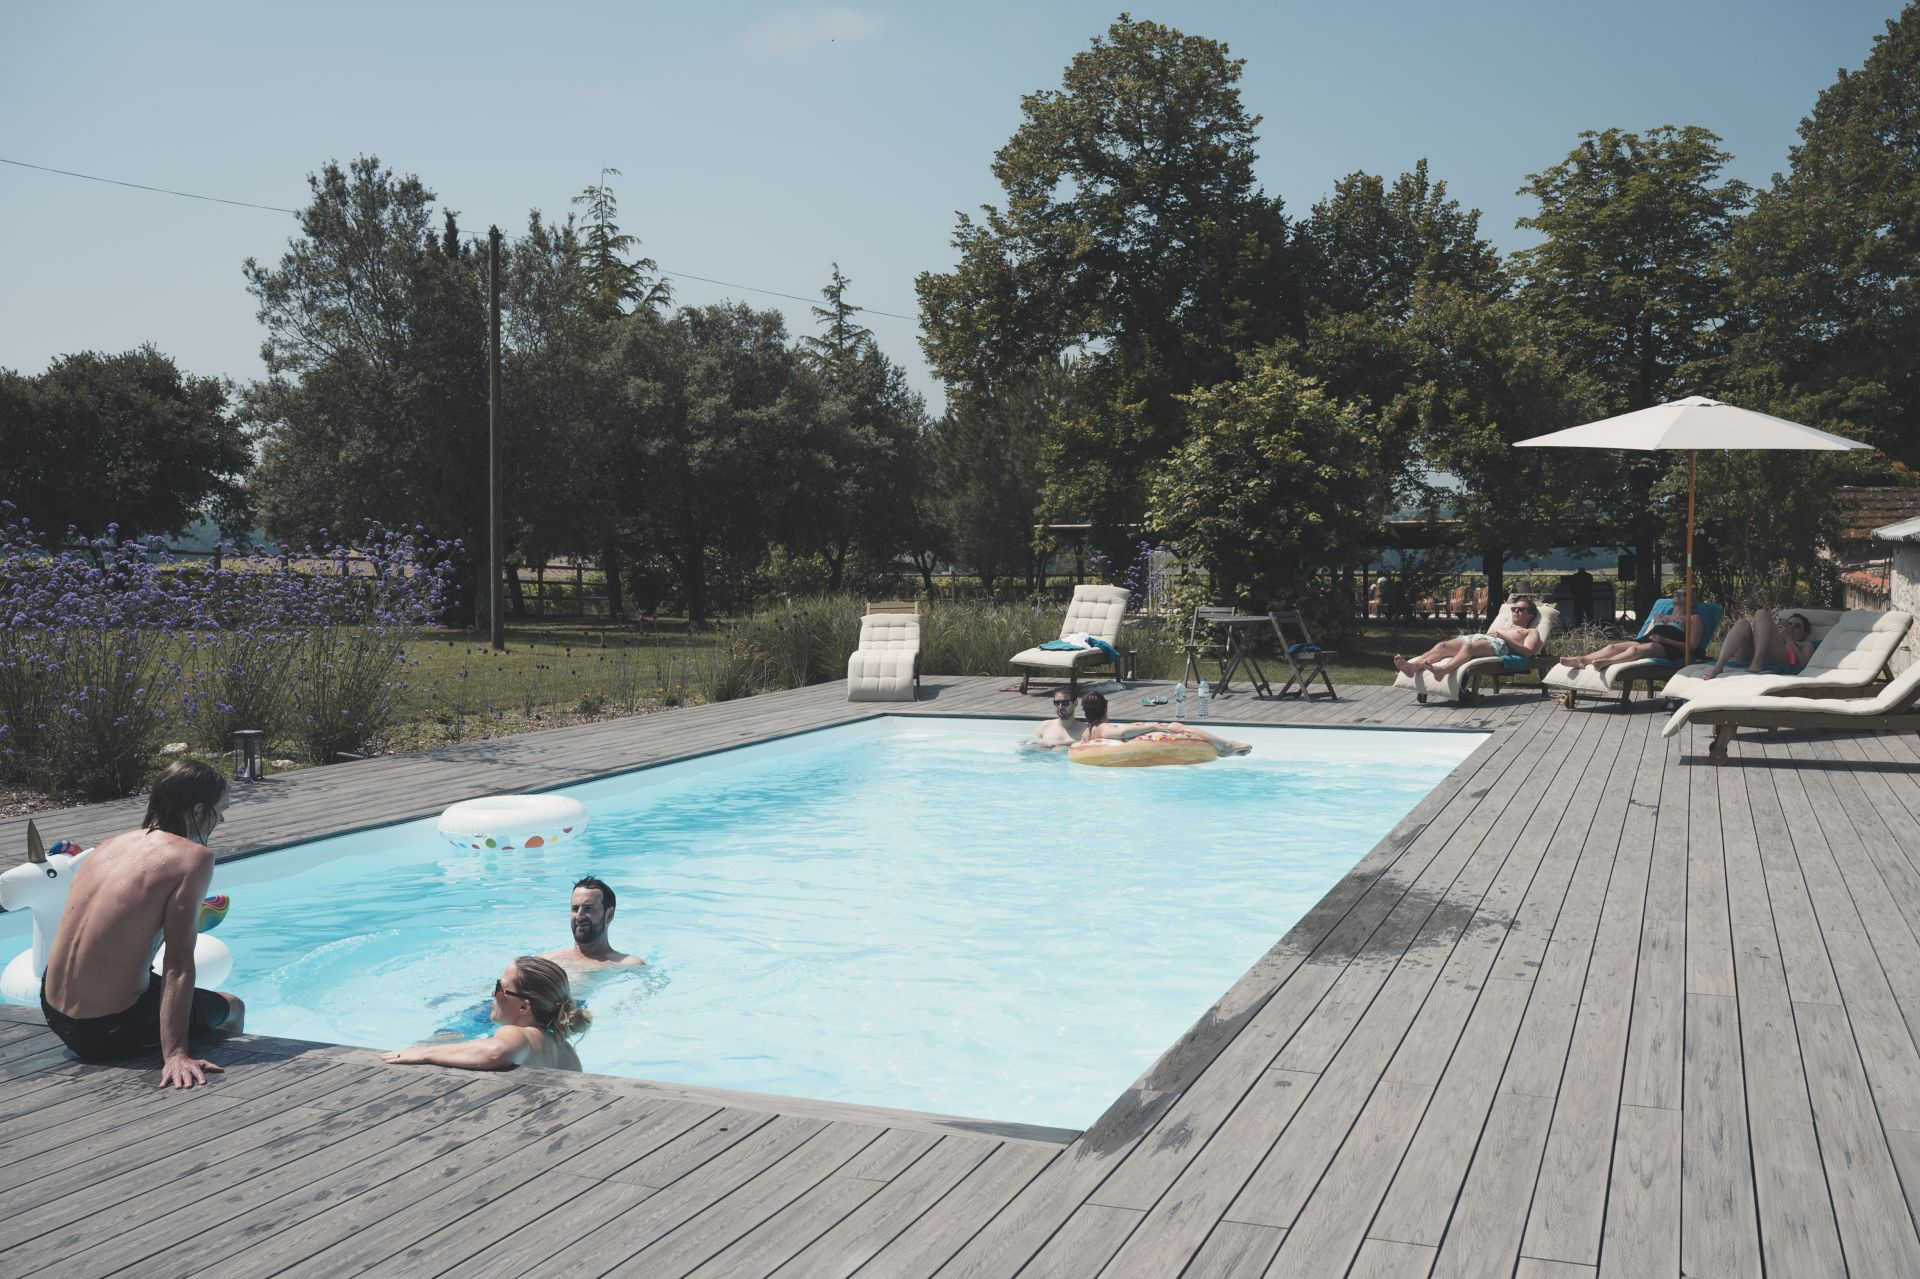 La Vue France Wedding - Swimming Pool - StuJarvis.com